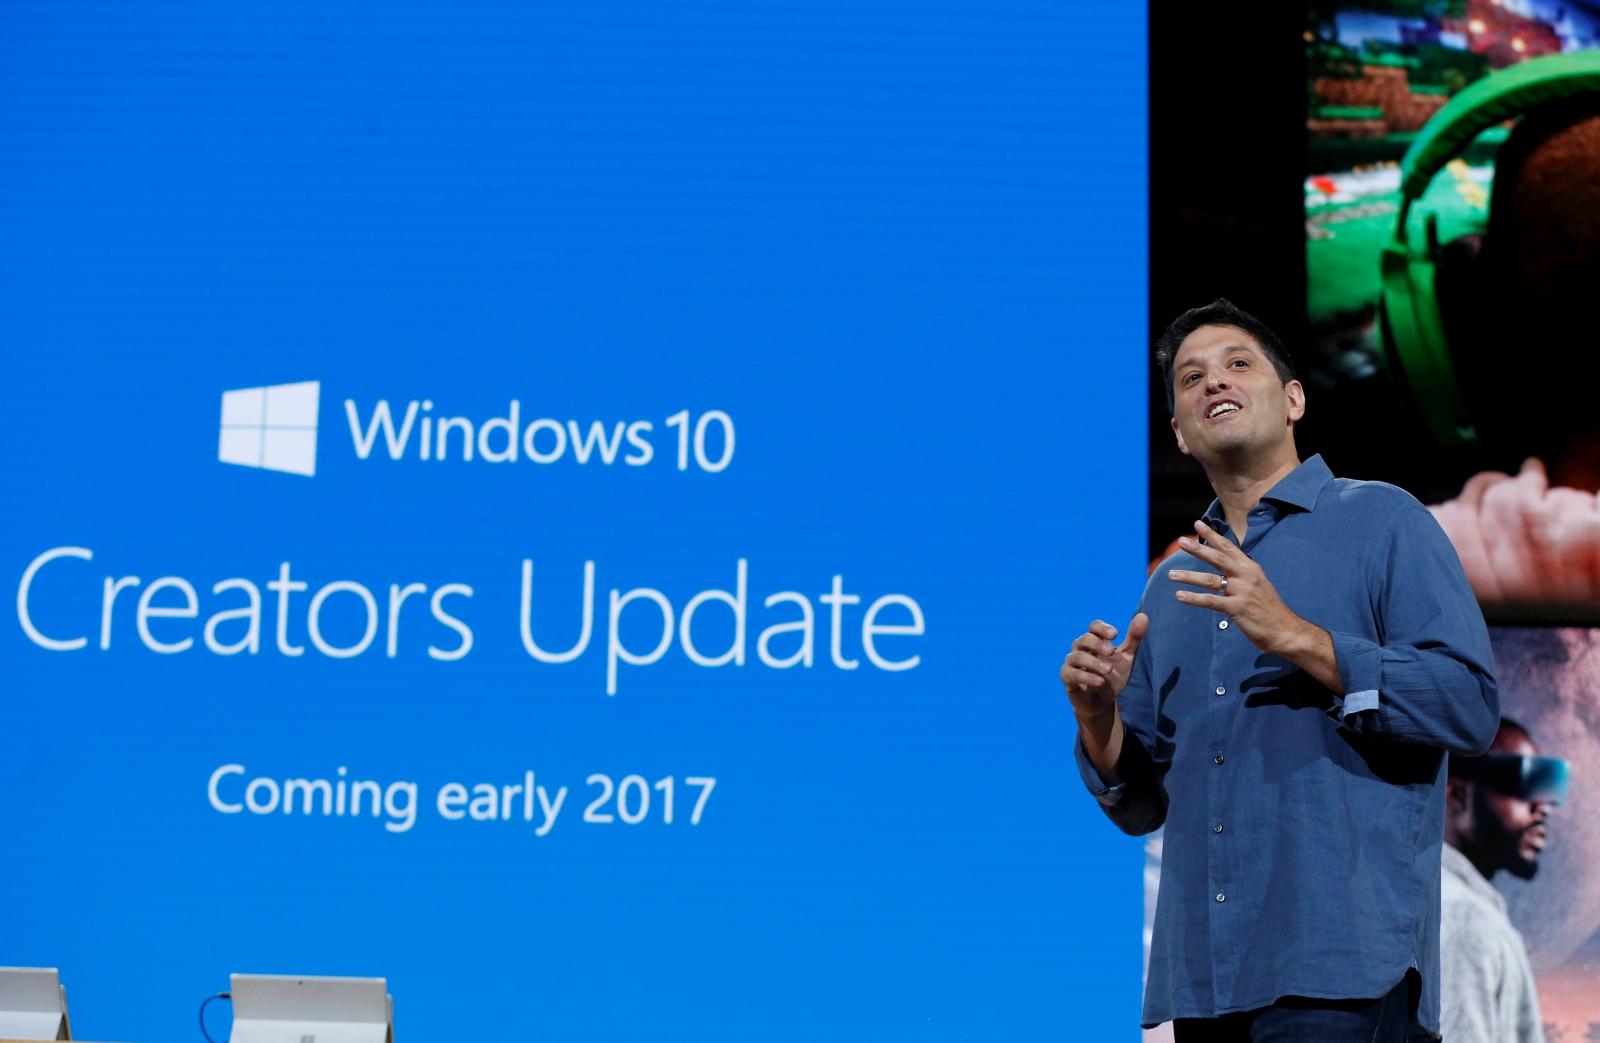 Windows 10 Creators Update privacy features